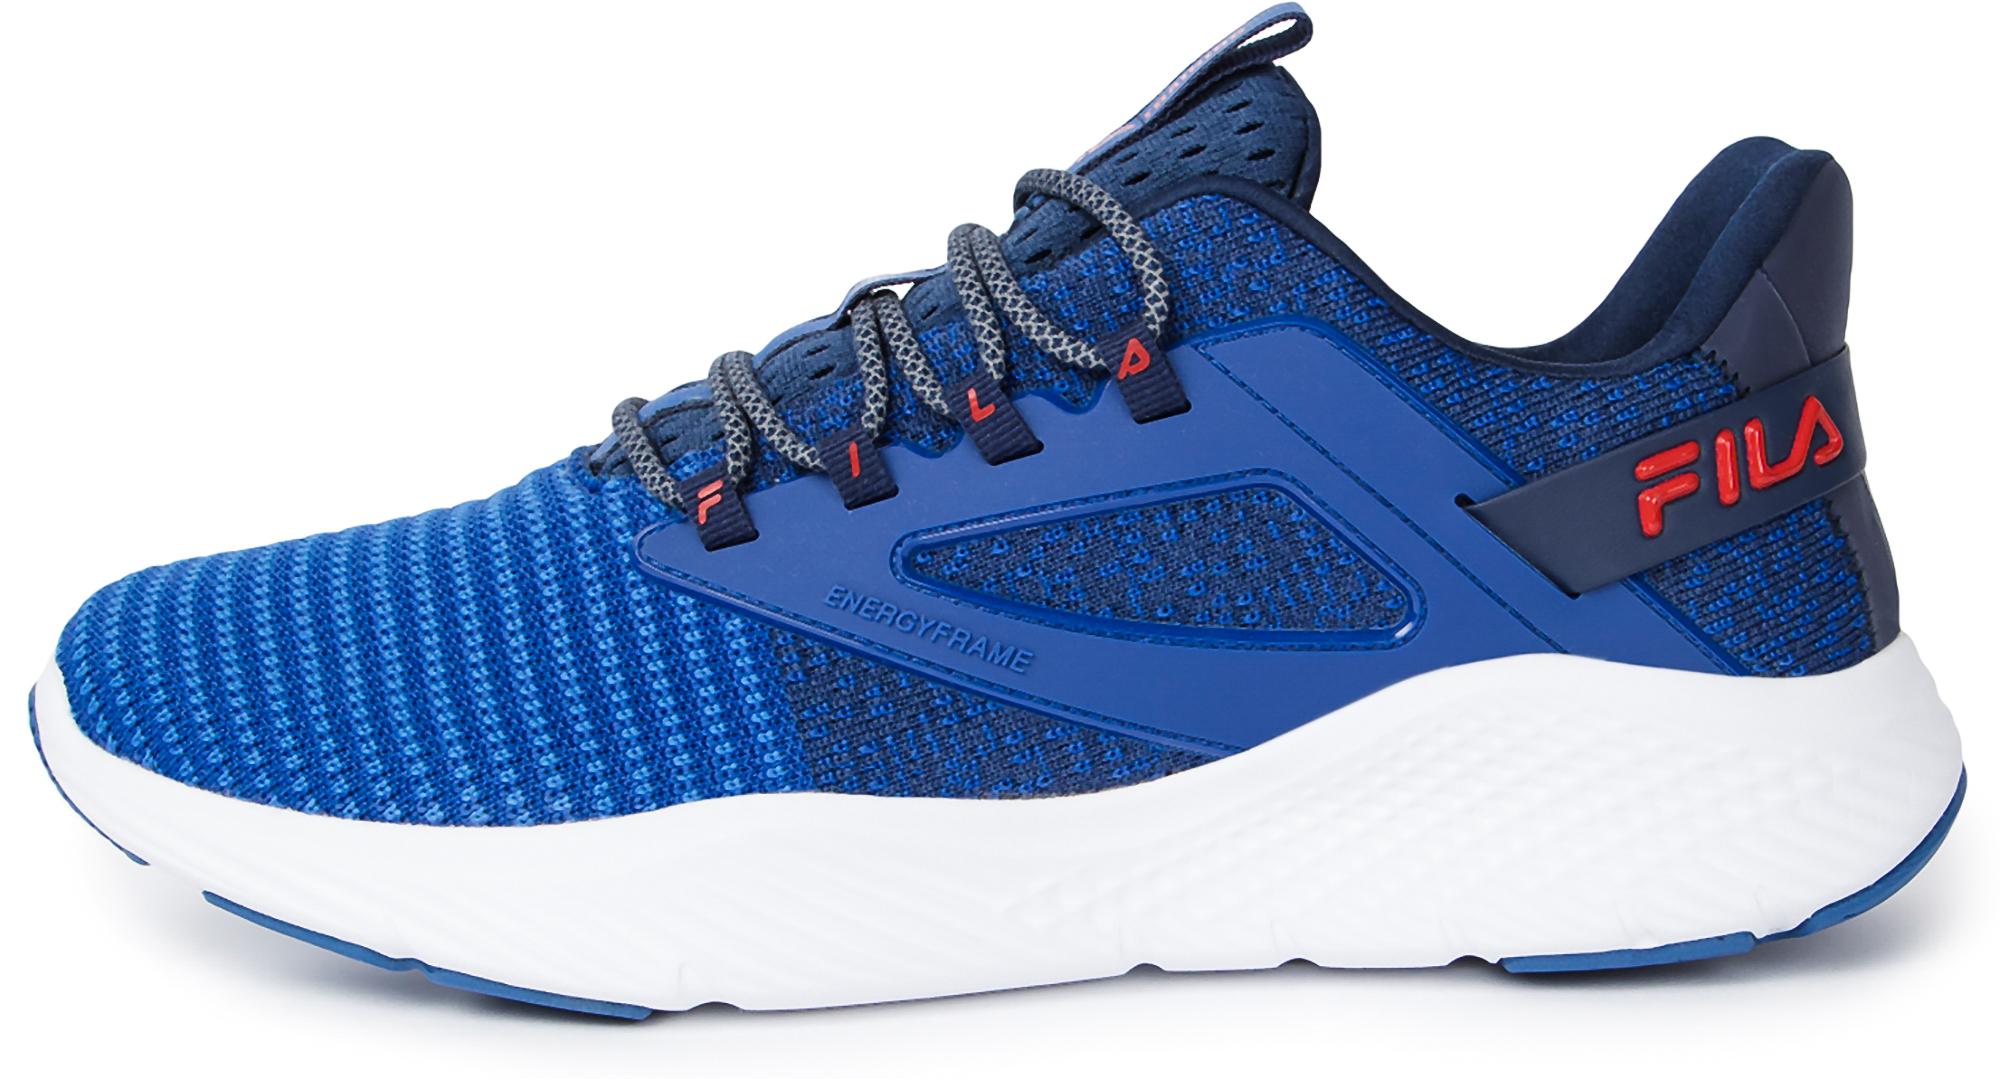 Fila Кроссовки мужские Fila FLASHBACK 2.0, размер 42 кроссовки мужские milton цвет синий 93012 размер 42